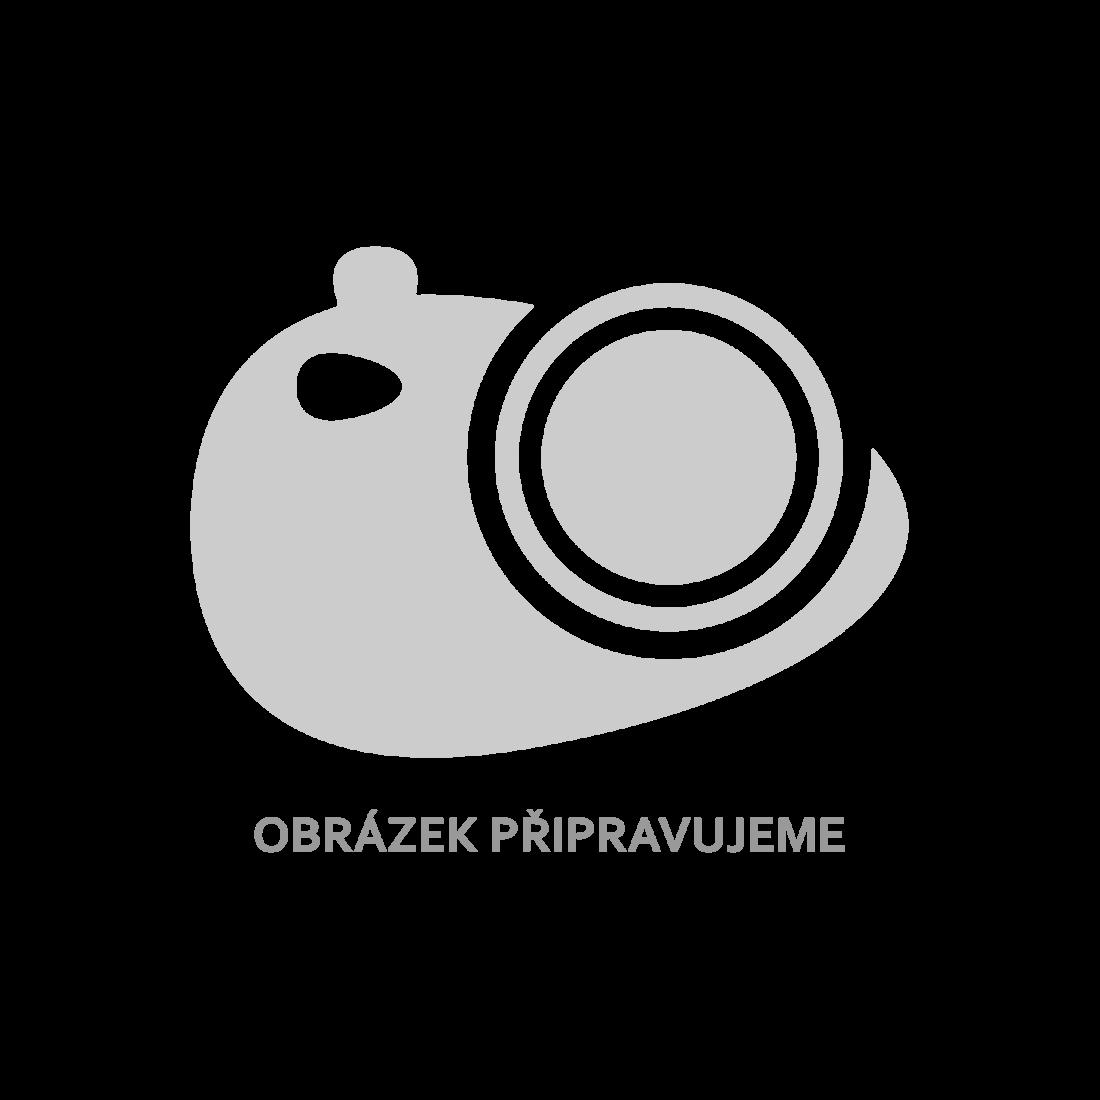 LED osvětlení akvária, 80 - 90 cm, IP 67